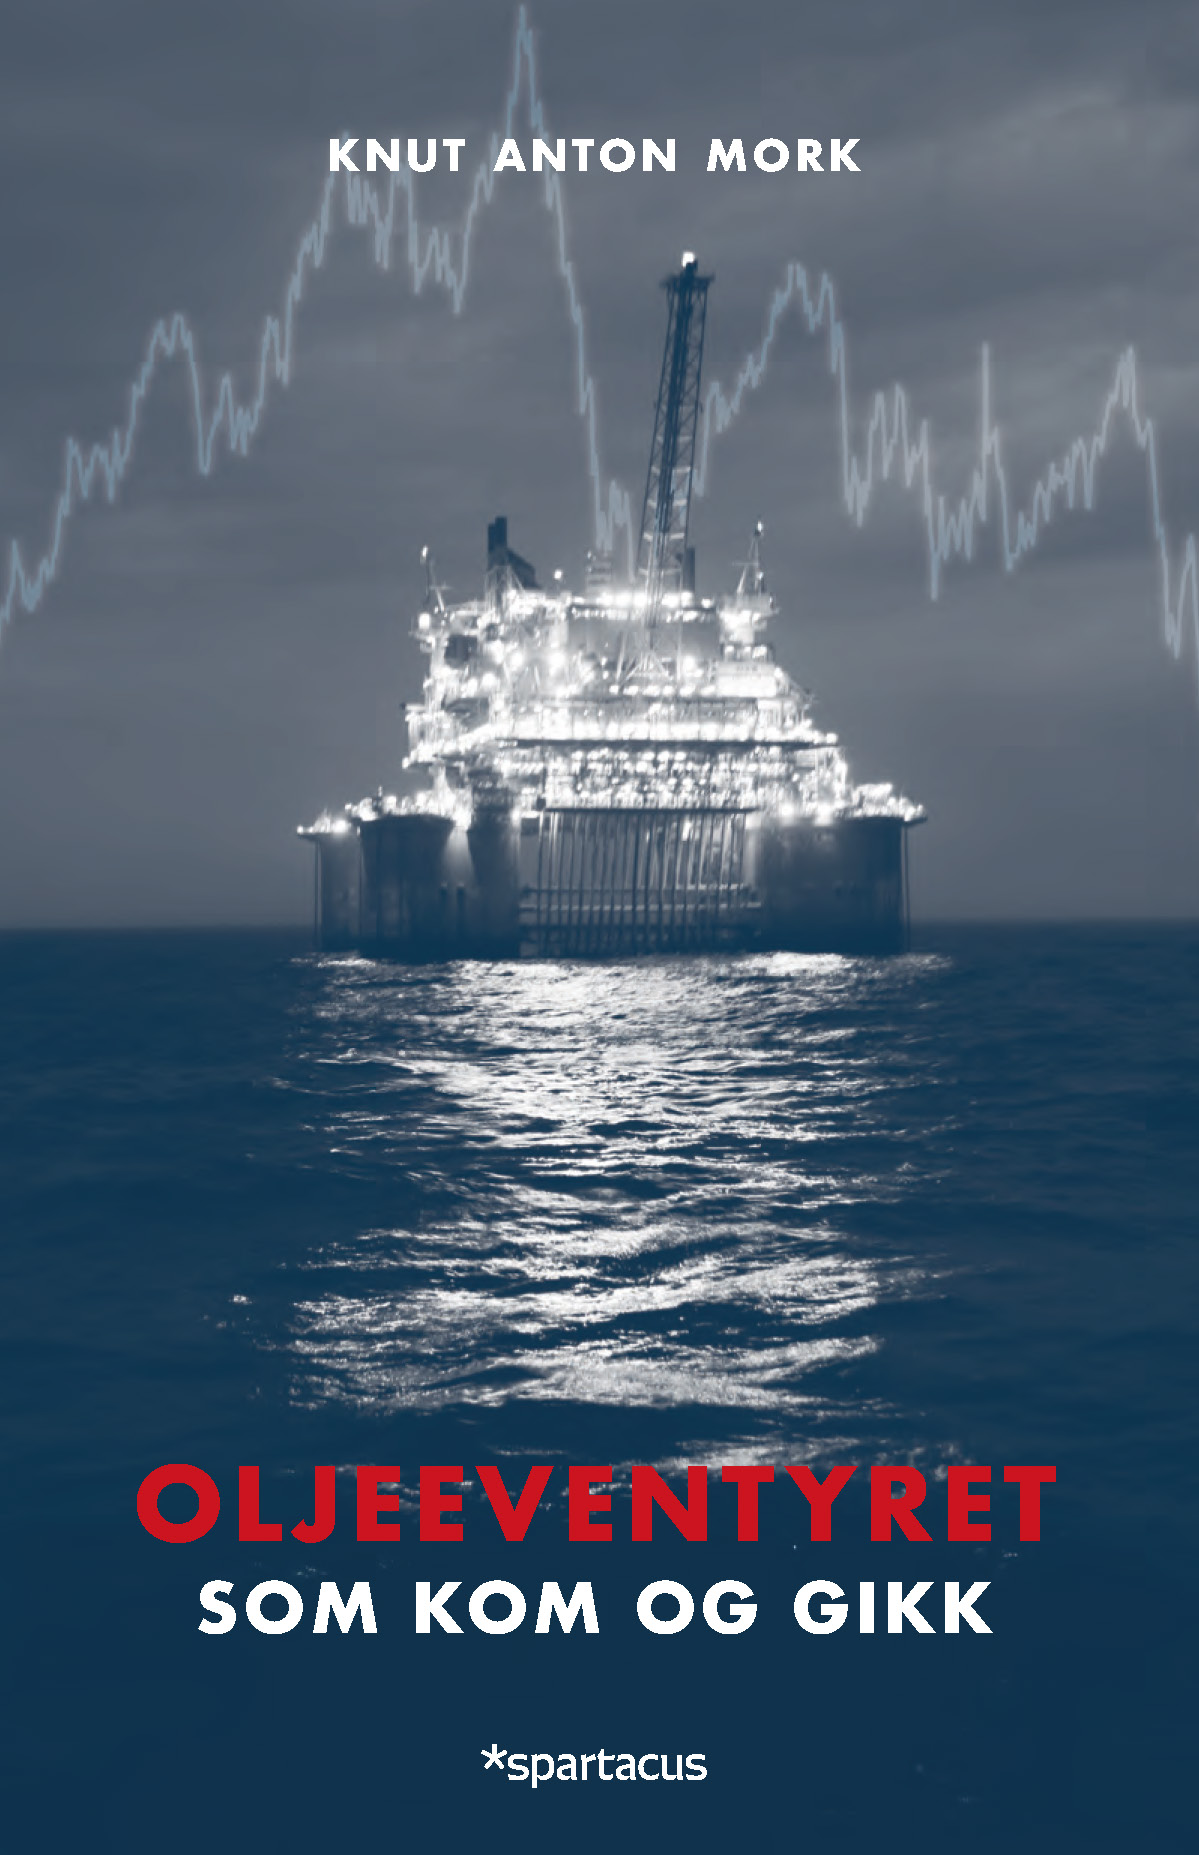 Oljeeventyret